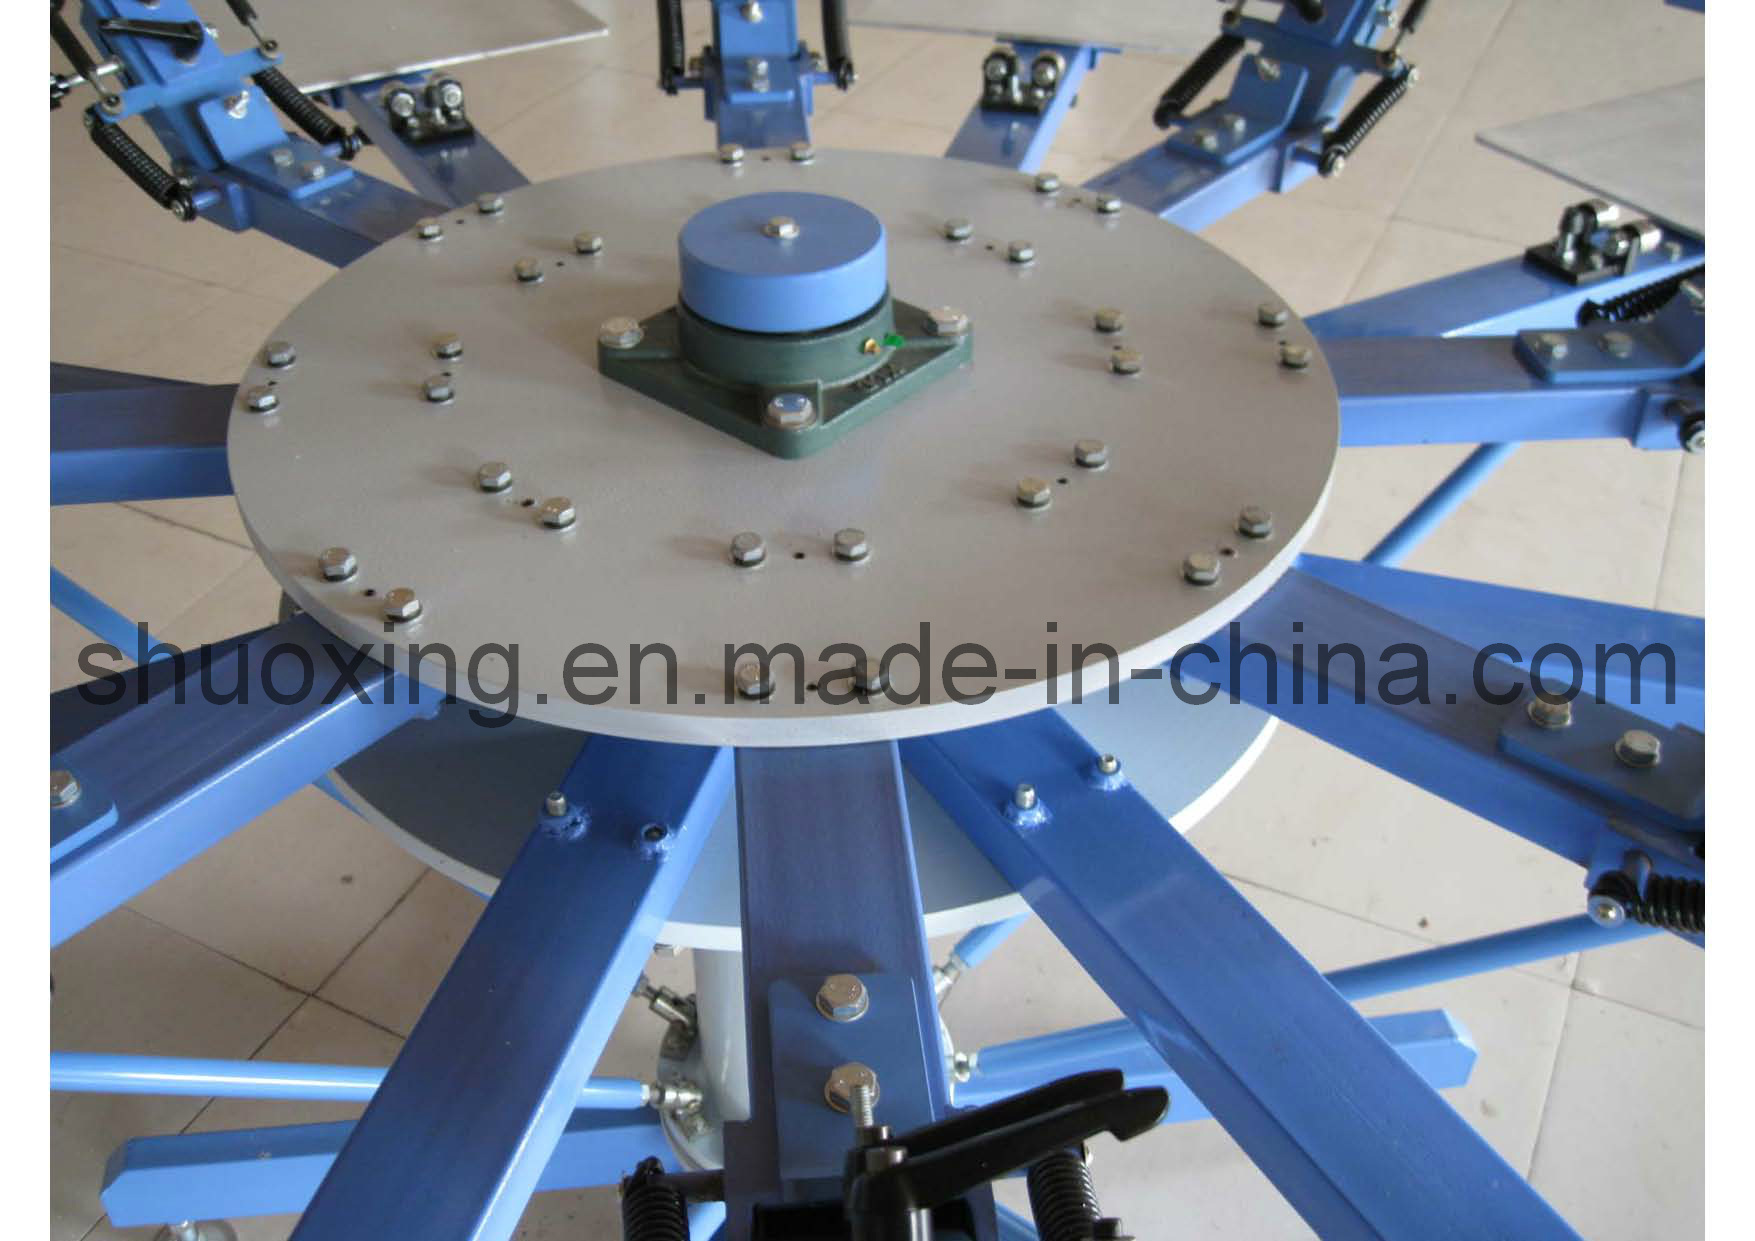 Manual T-Shirt Silk Screen Printing Machine (Side clamp system)